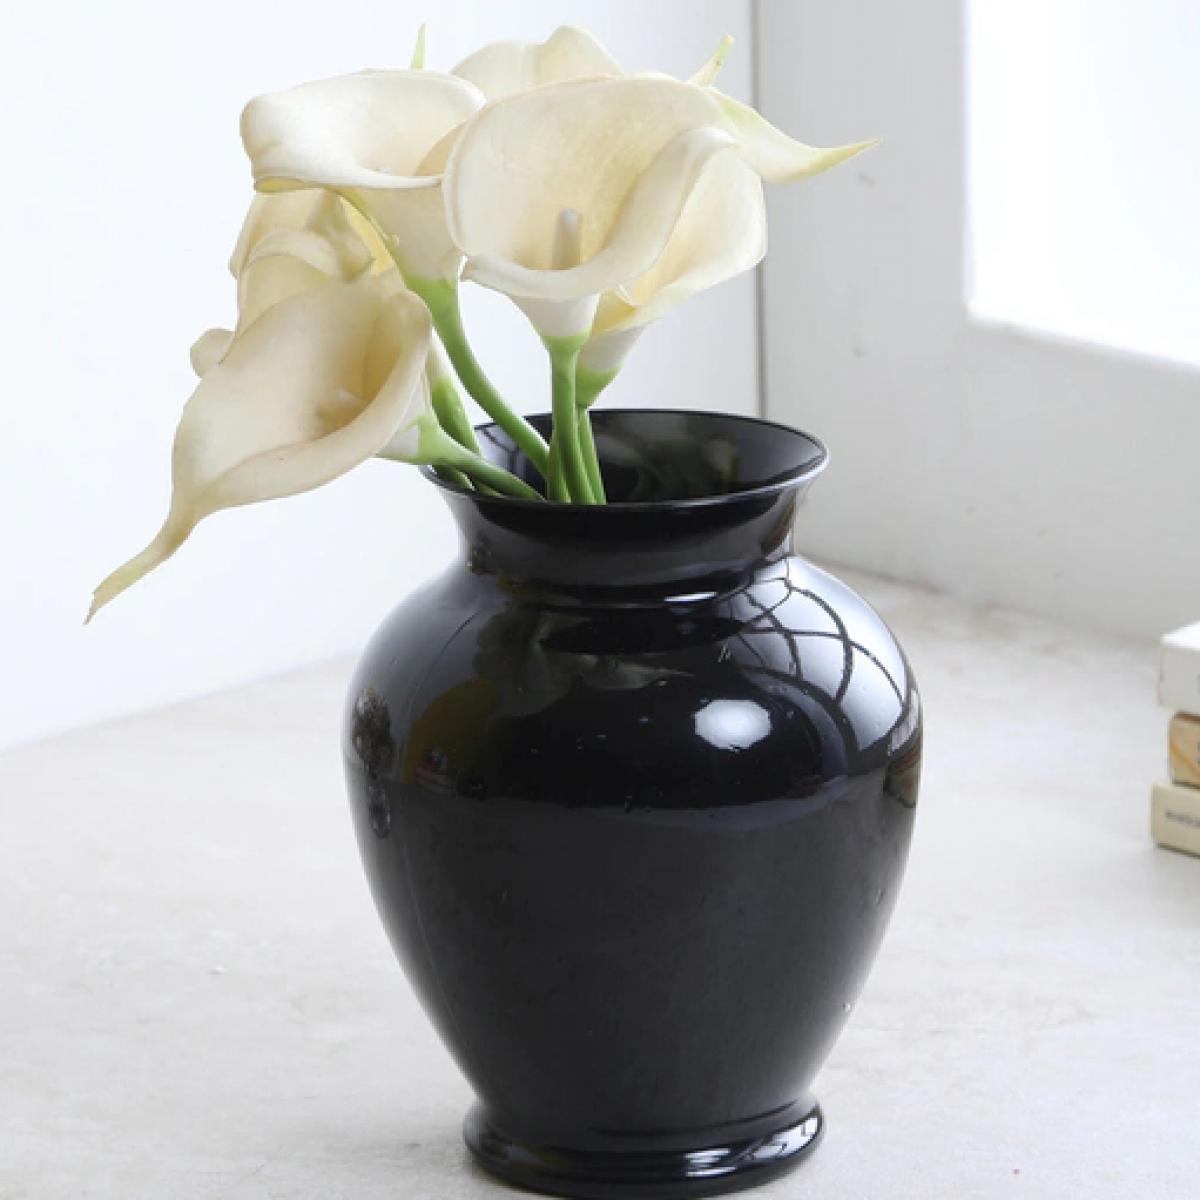 Ginger Black 9x16cm Acrylic Vase - 1 No